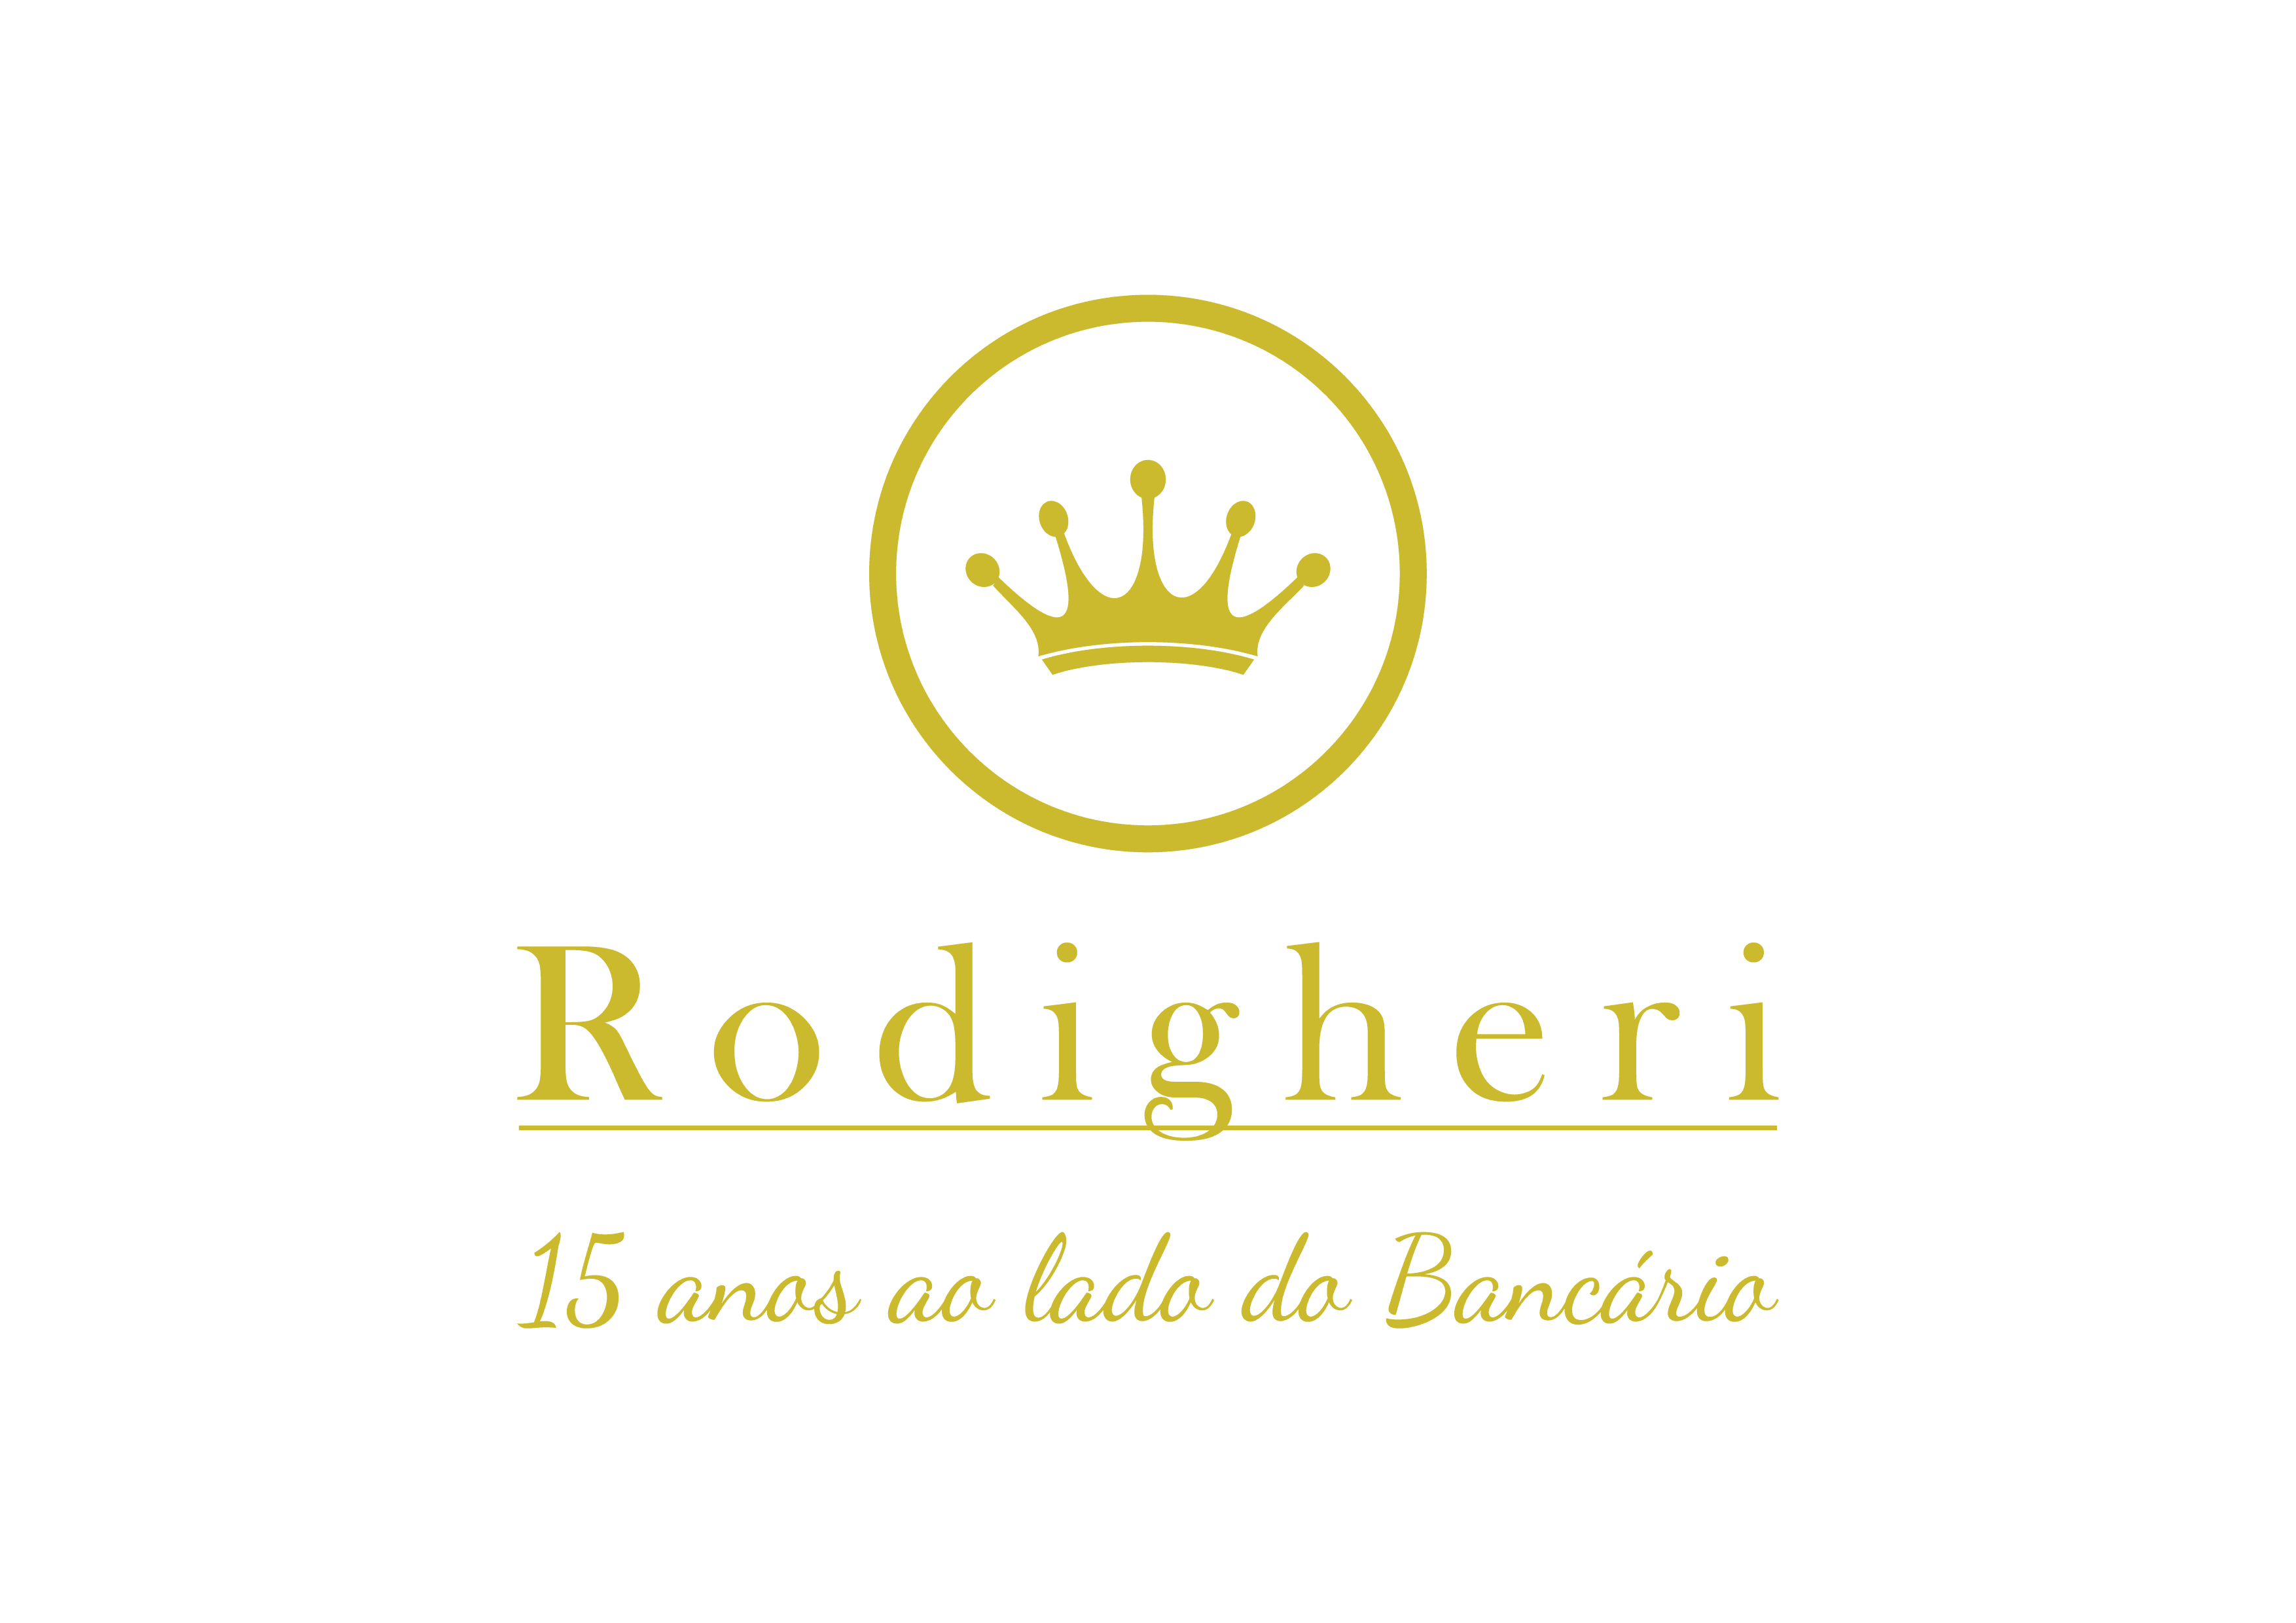 Rodigheri